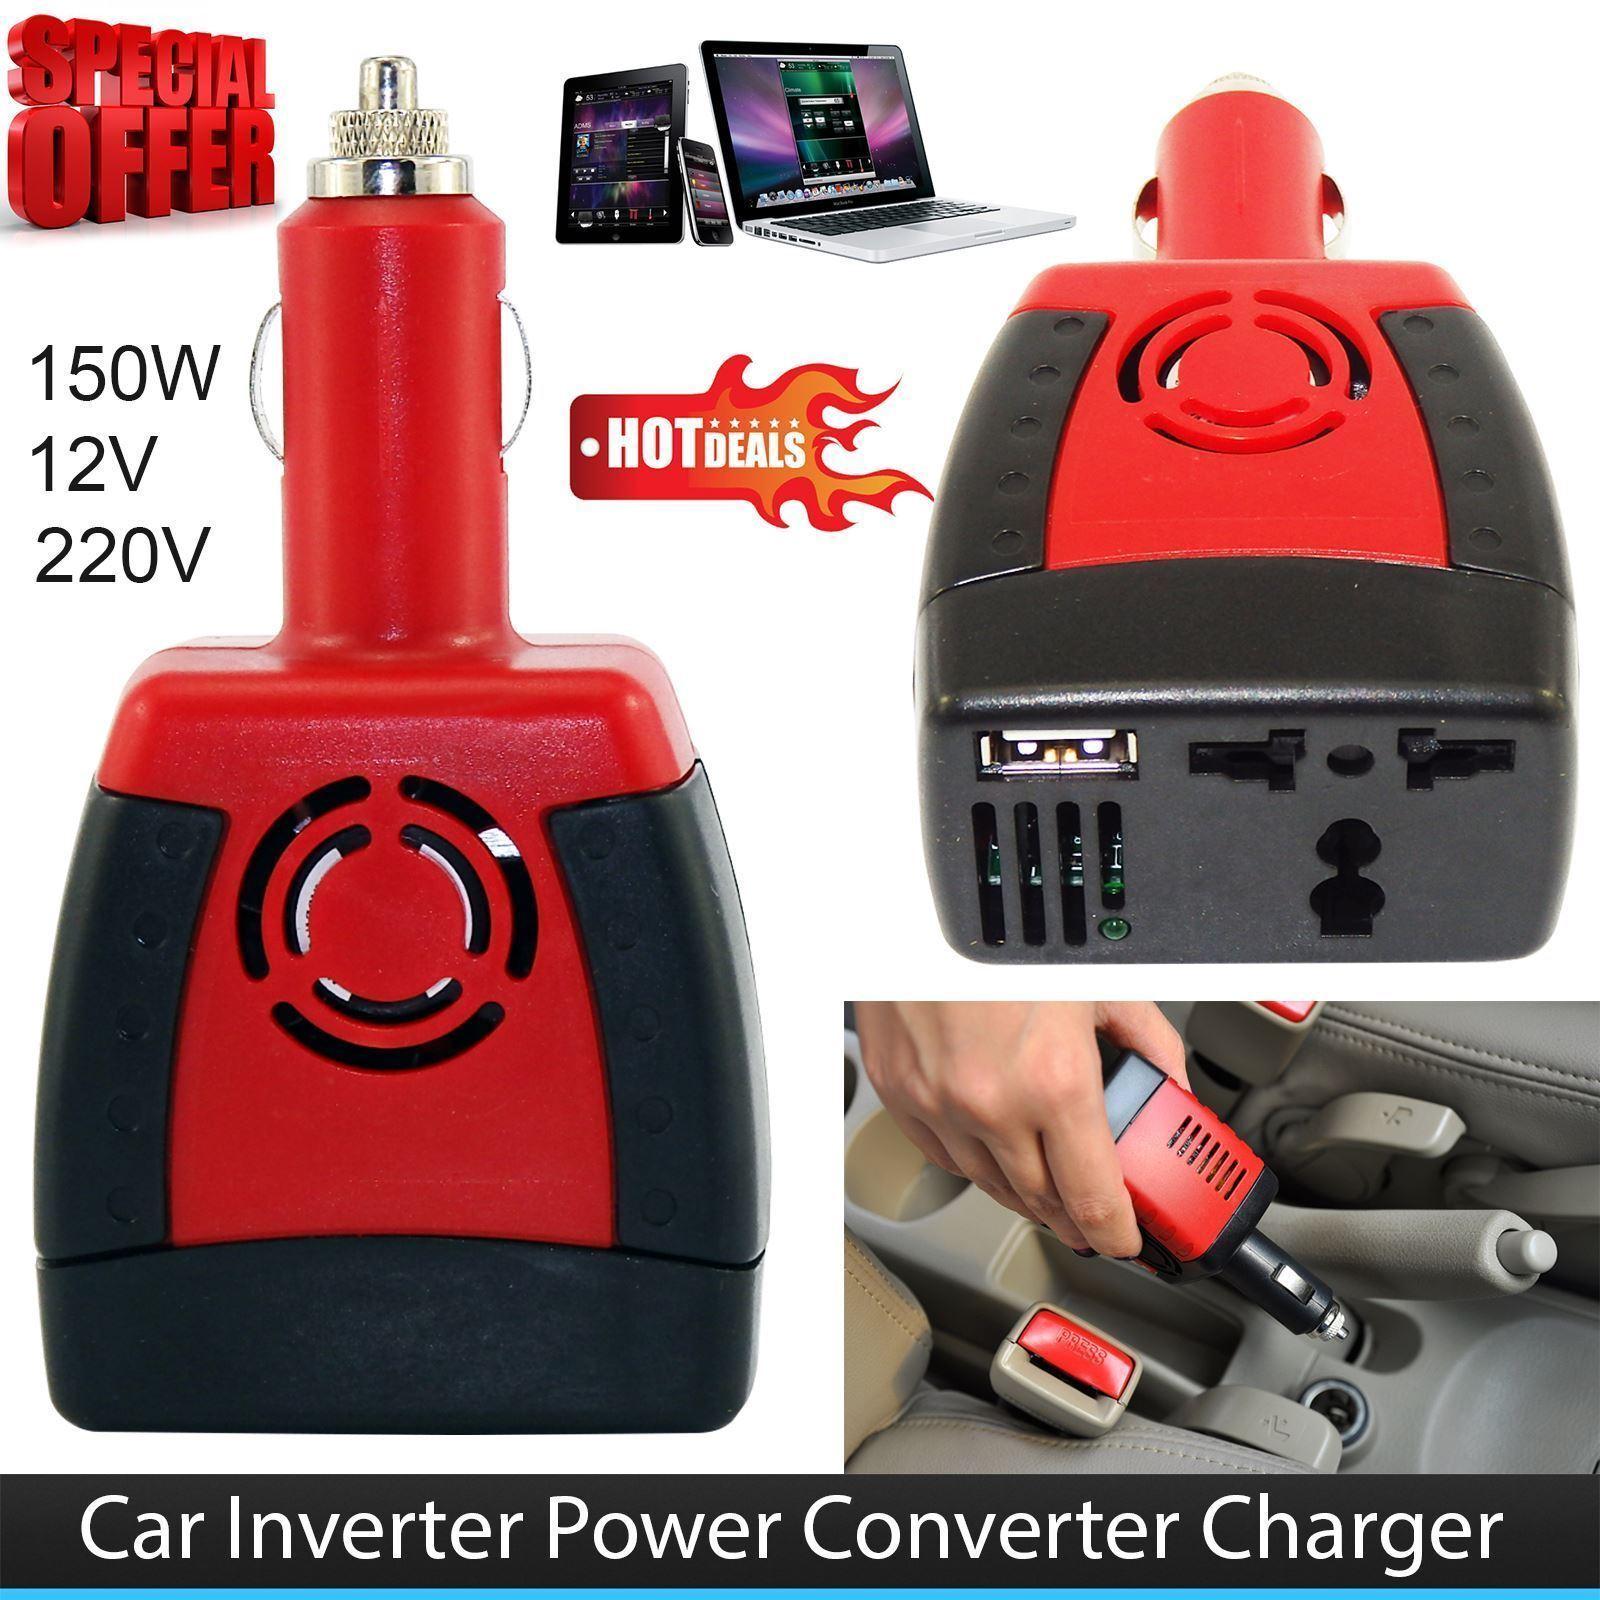 12V DC to 240V AC 150W Power Inverter USB Car Boat for PSP NDS Laptop Charger Q@